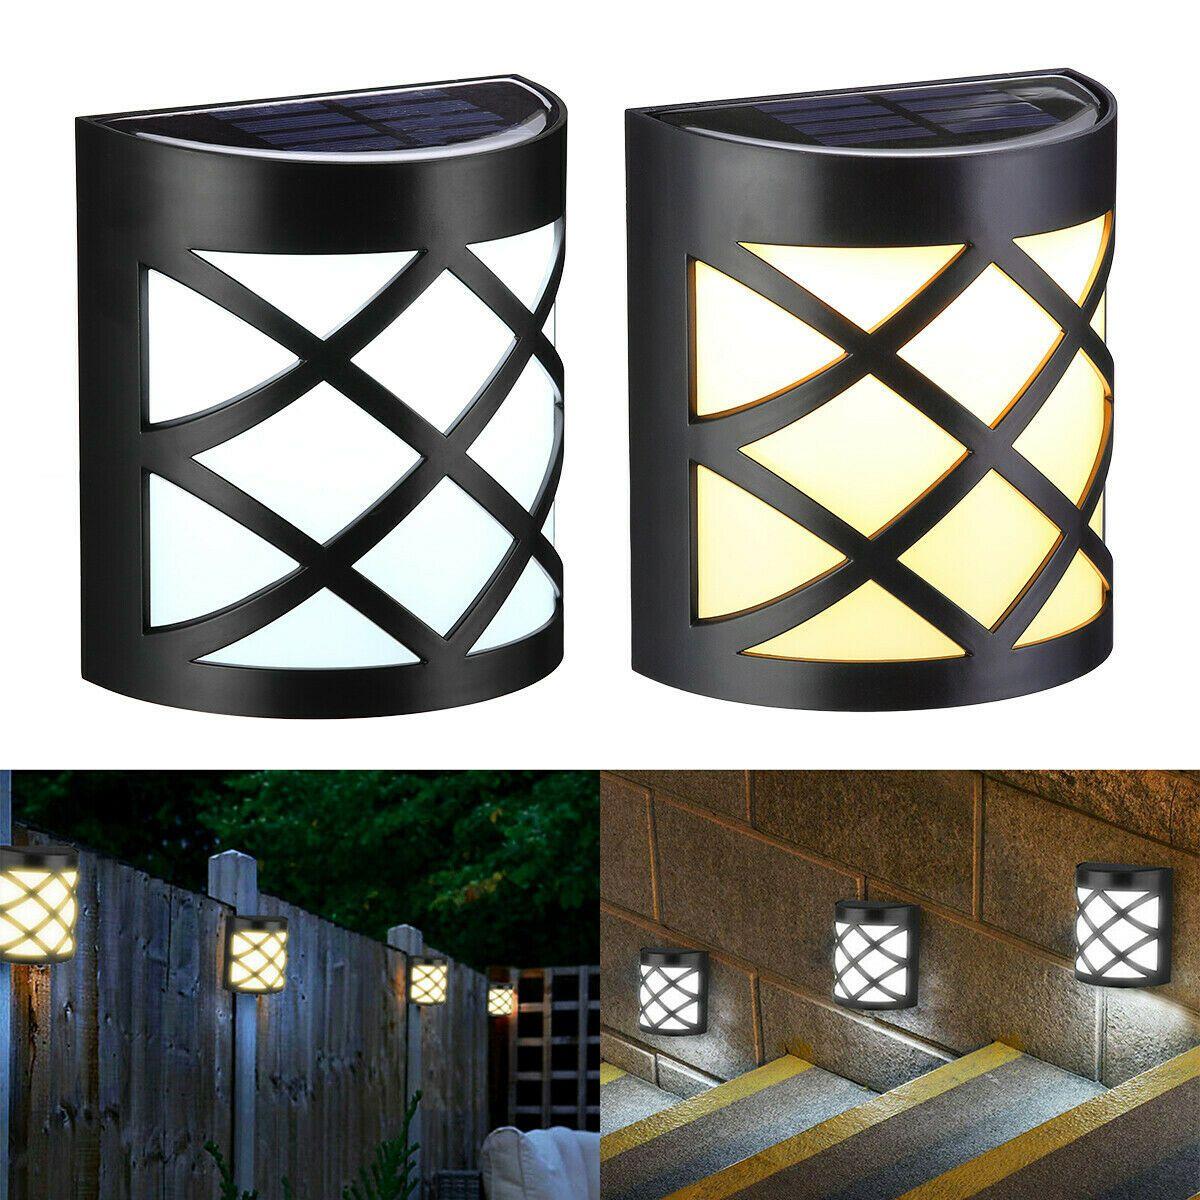 Details About Solar Led Motion Sensor Light 6 Leds Wall Mount Light Waterproof Outdoor Garden Wall Mounted Light Outdoor Wall Lighting Solar Lamp